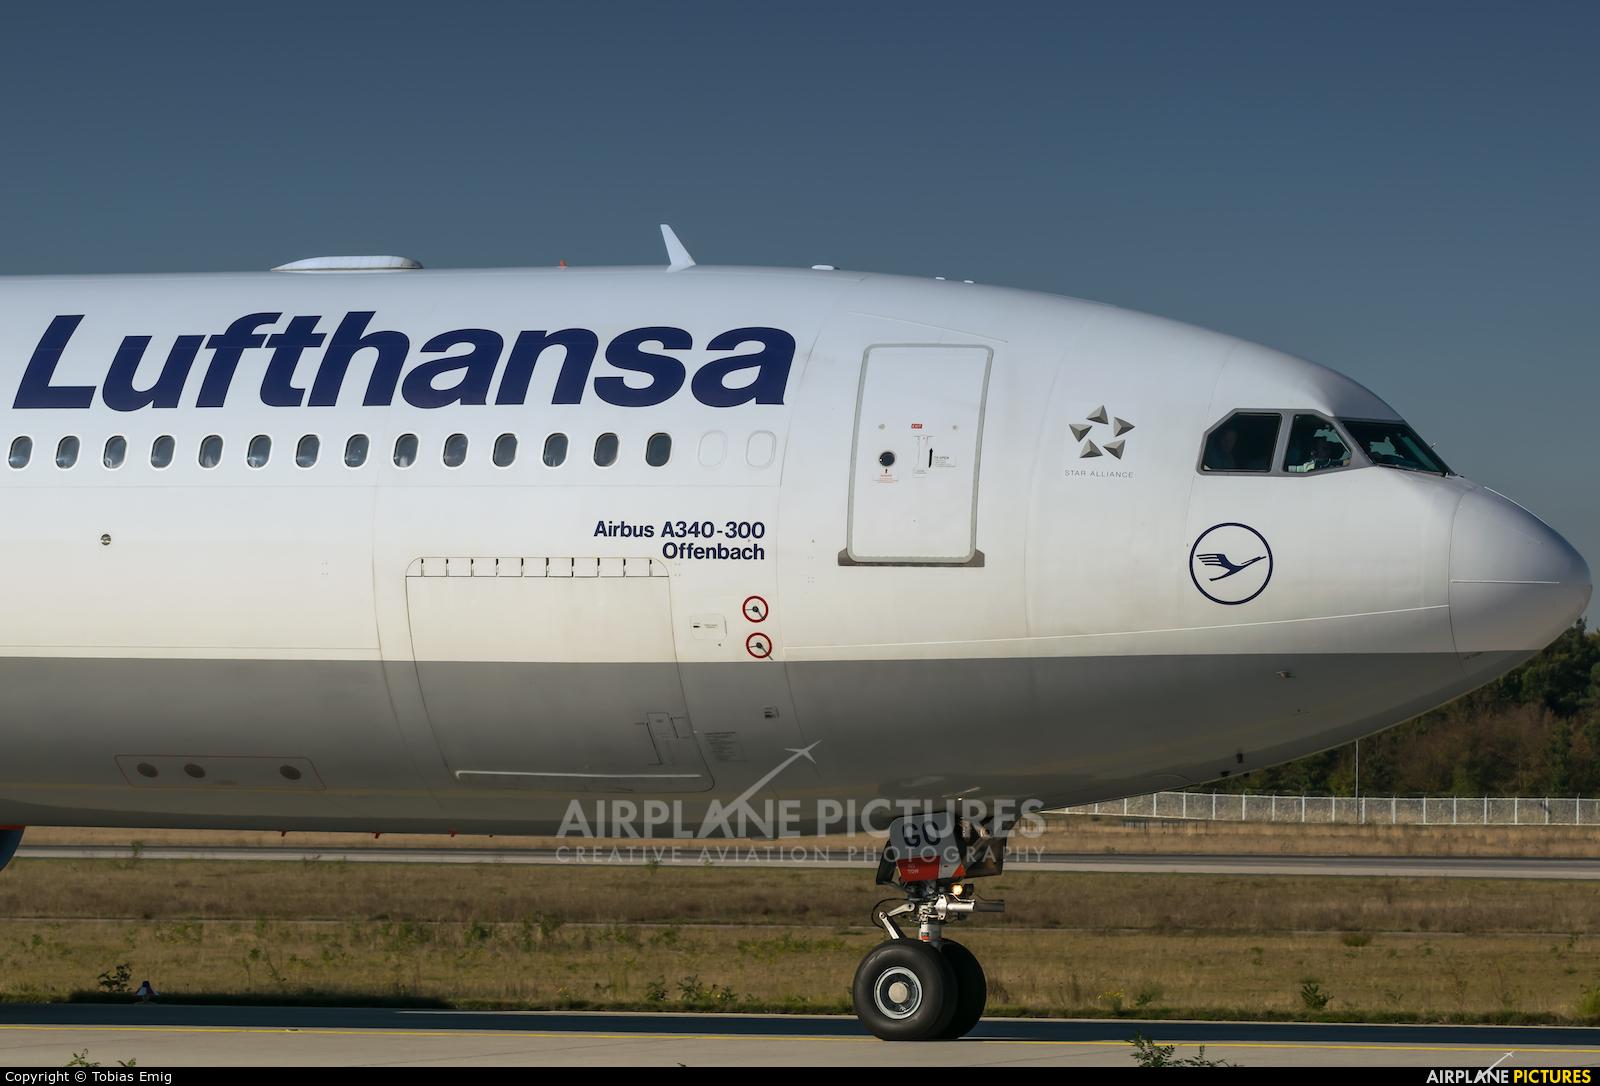 Lufthansa D-AIGO aircraft at Frankfurt